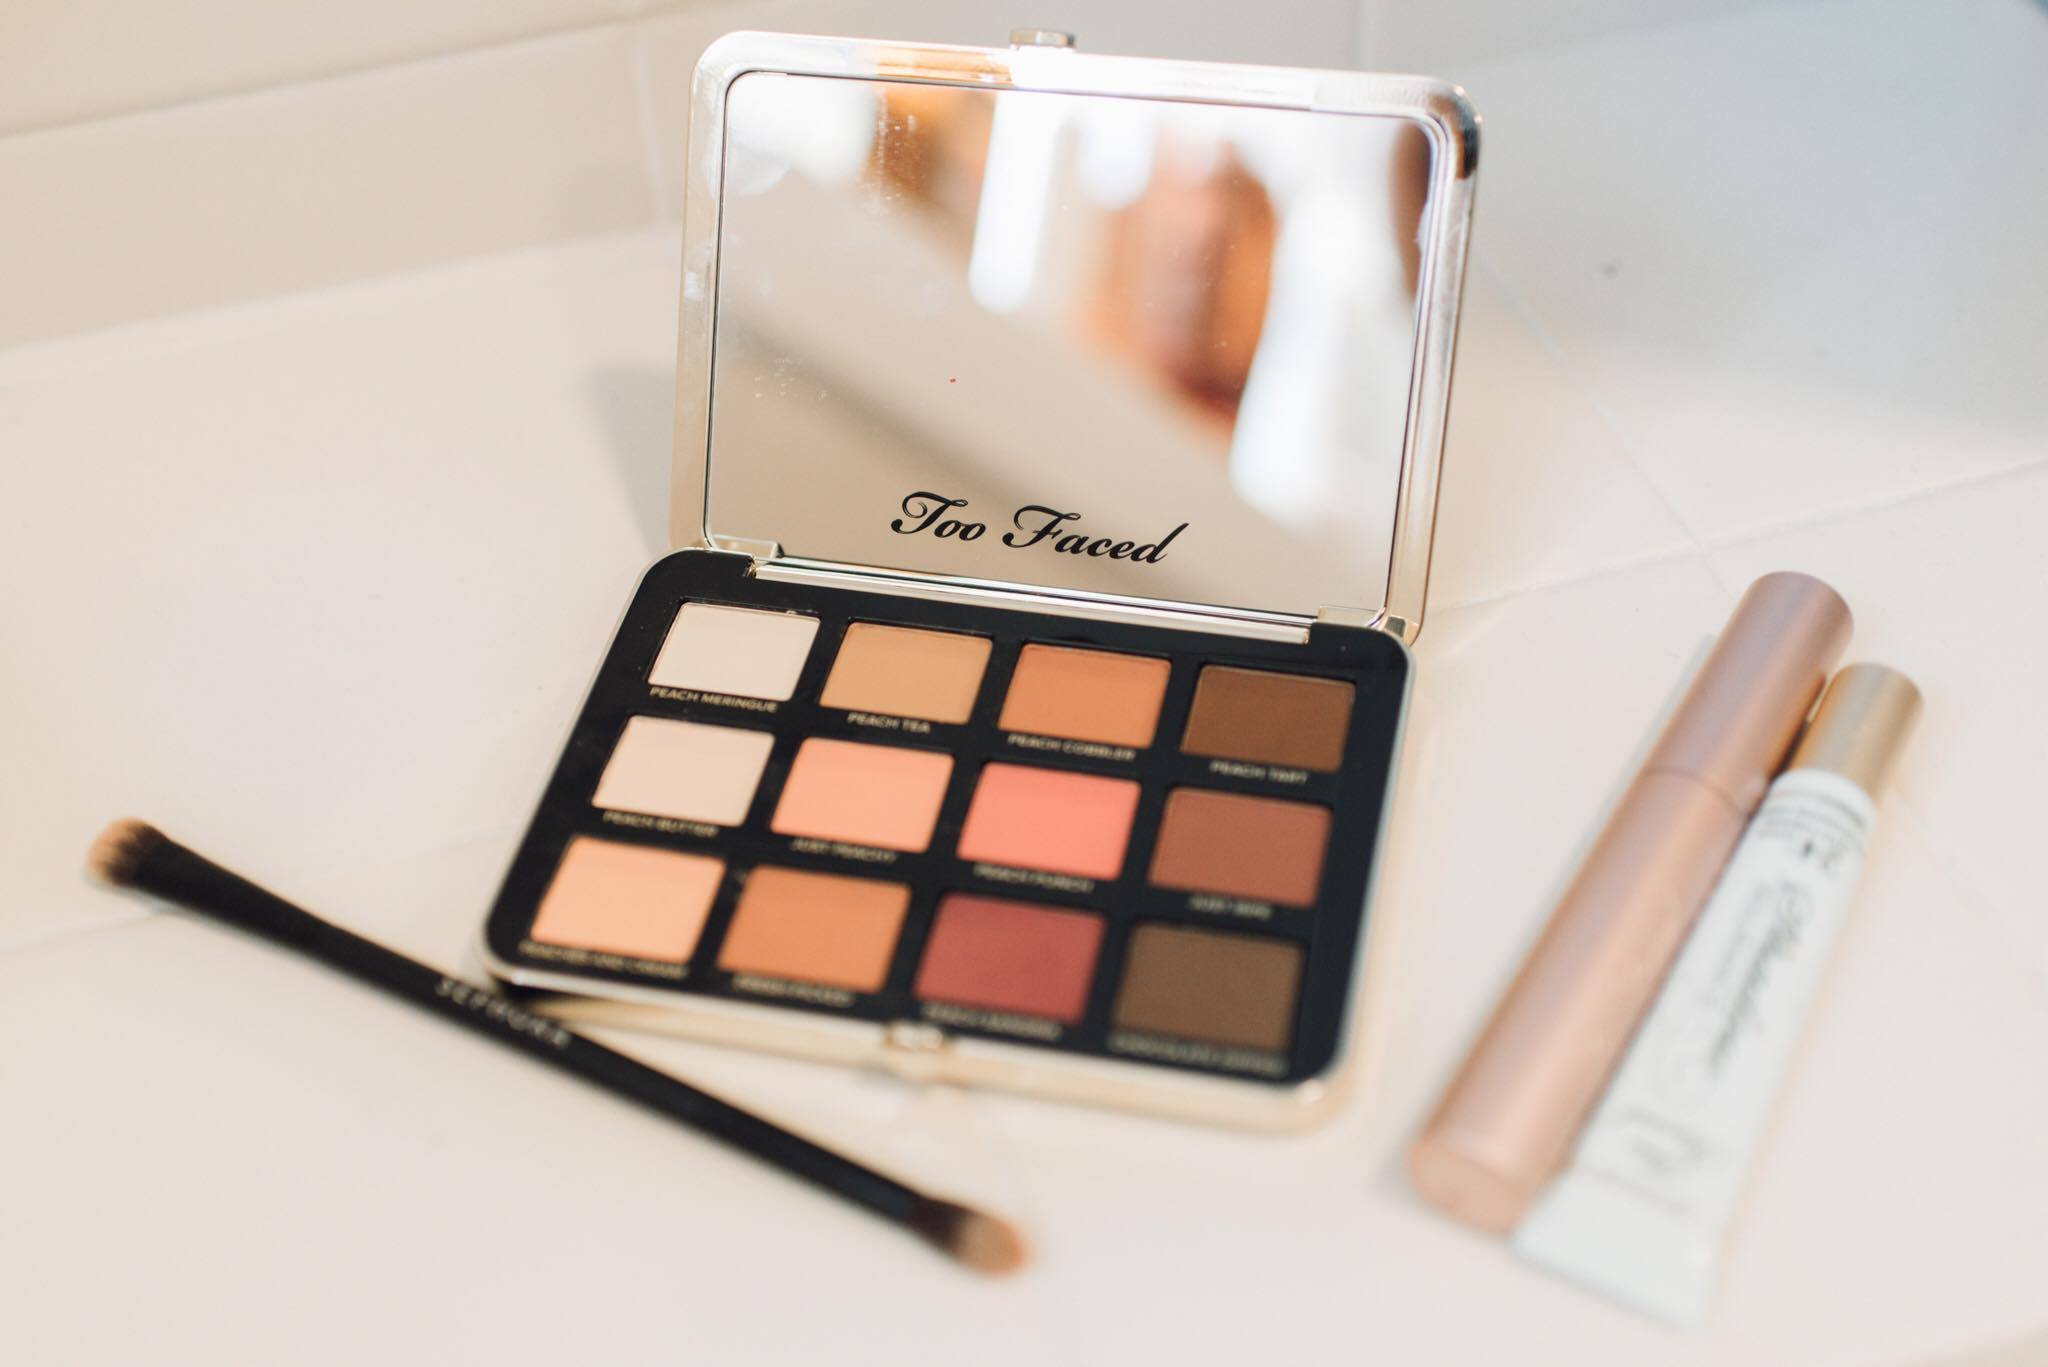 The 5 Minute Peachy Eye Makeup Tutorial by popular style blogger MomCrushMonday